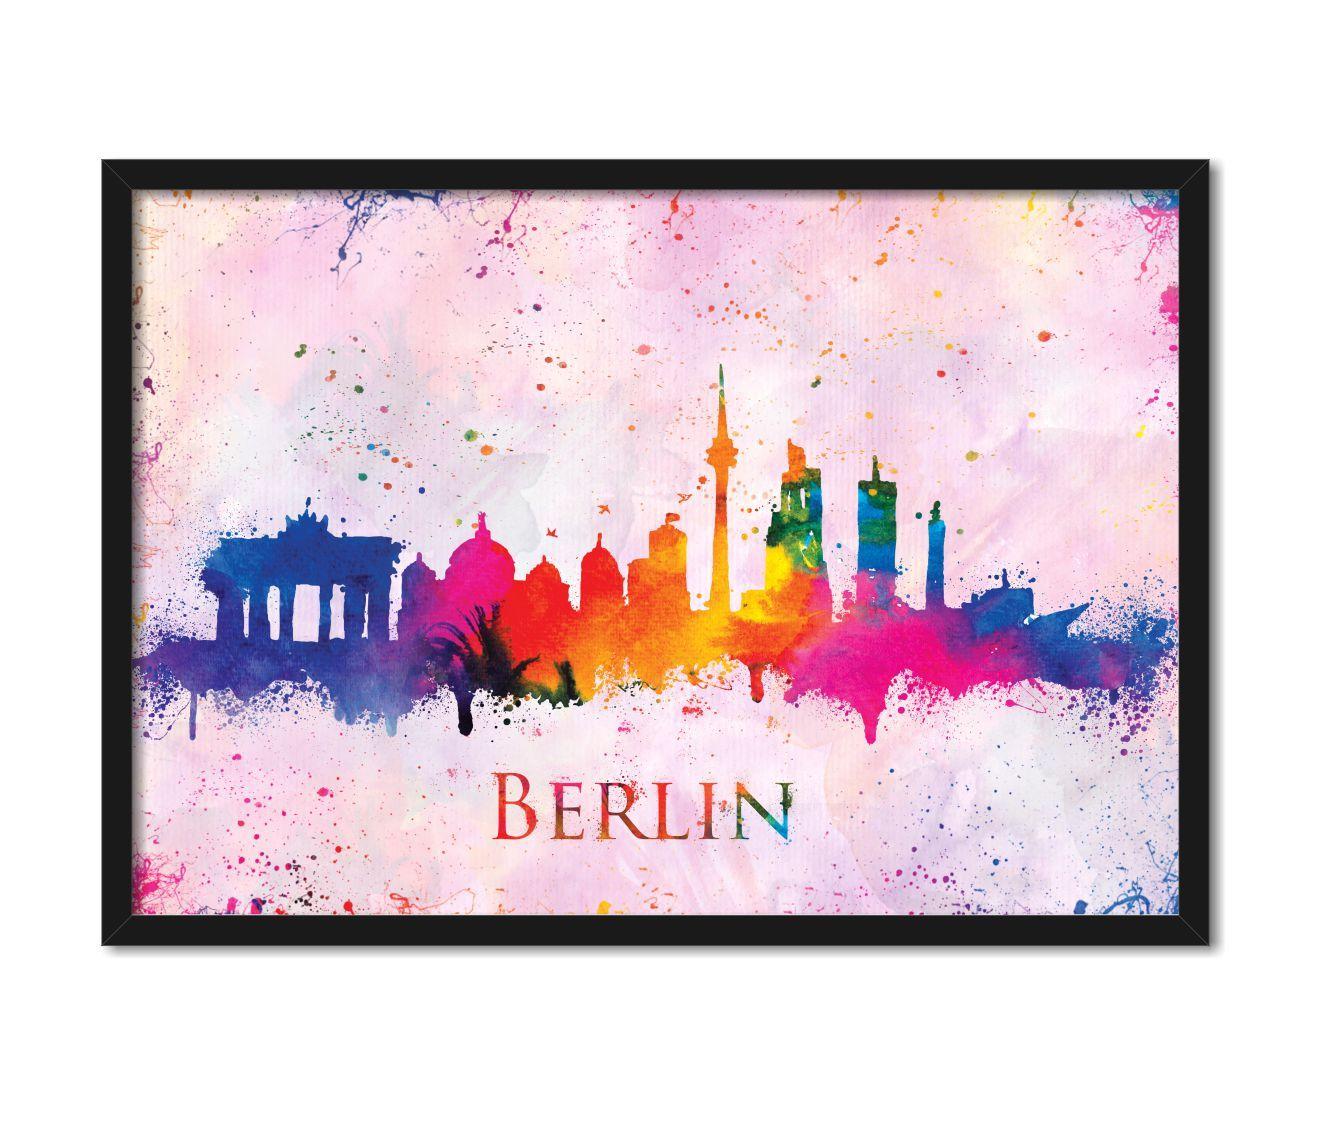 #BerlinCityGermanySkylineAbstractWatercolor #watercolorillustrationartprint #skylineposter #watercolorcityskylineposter #cityscapewallart #BerlinCityGermanyposter #BerlinCityGermanyskylinewallartposter #BerlinCityGermanyskylinepainting #BrandenburgGateposter